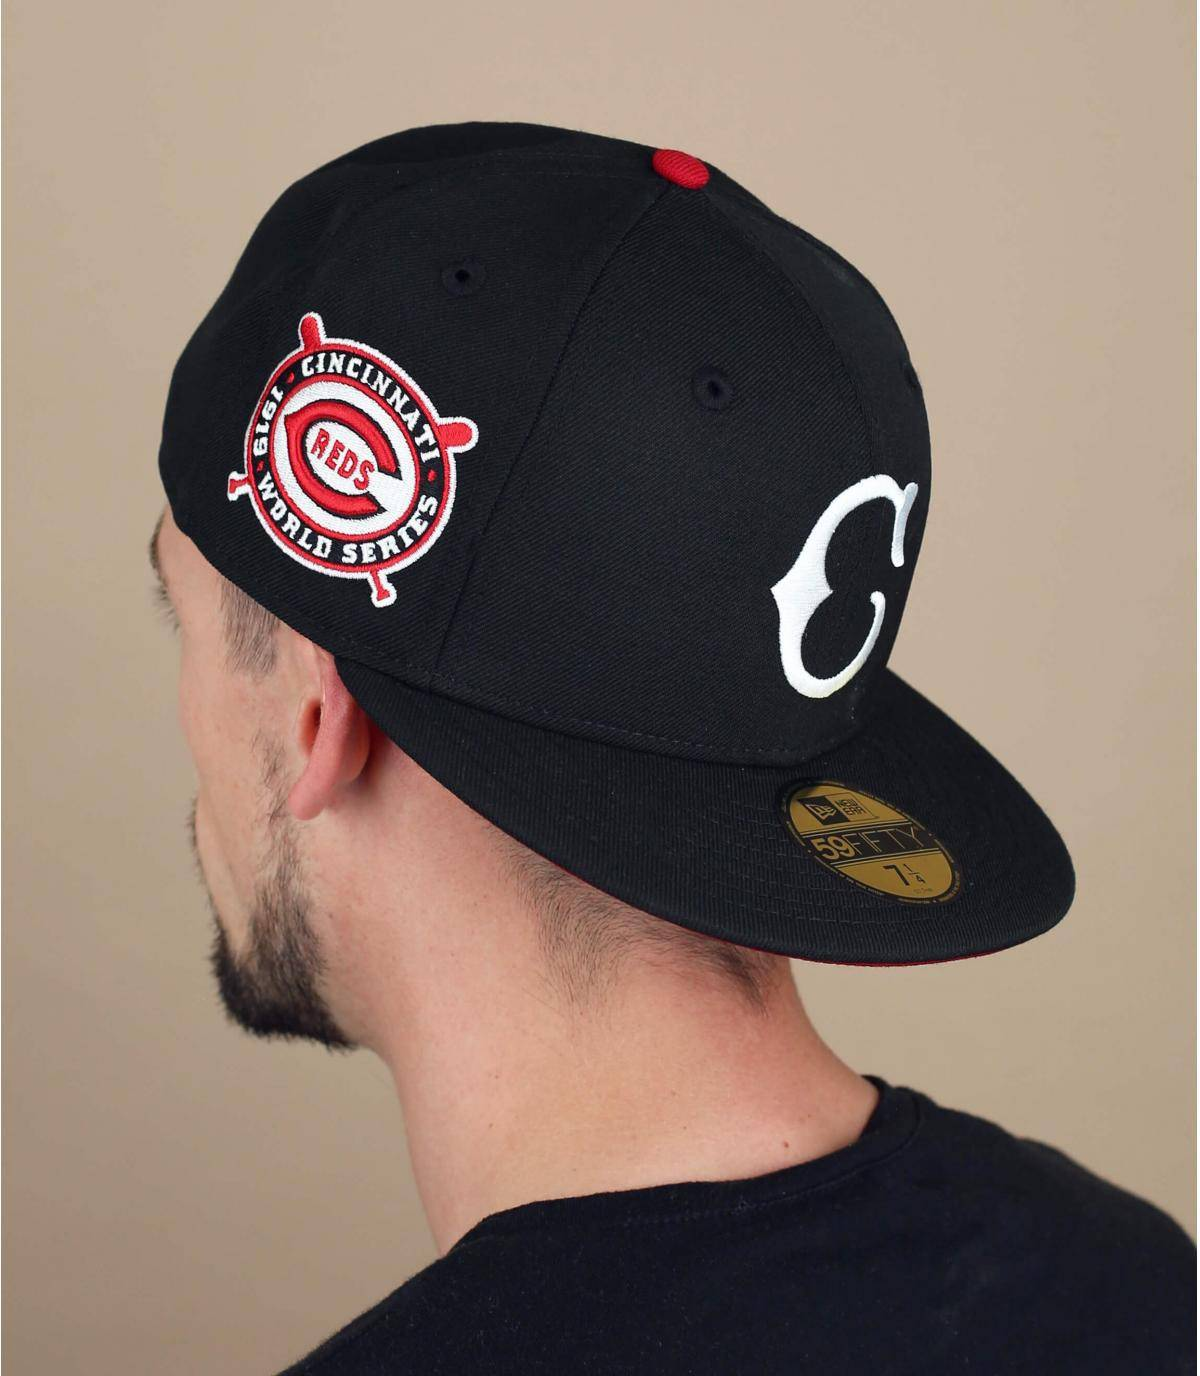 Cincinnati Reds cap